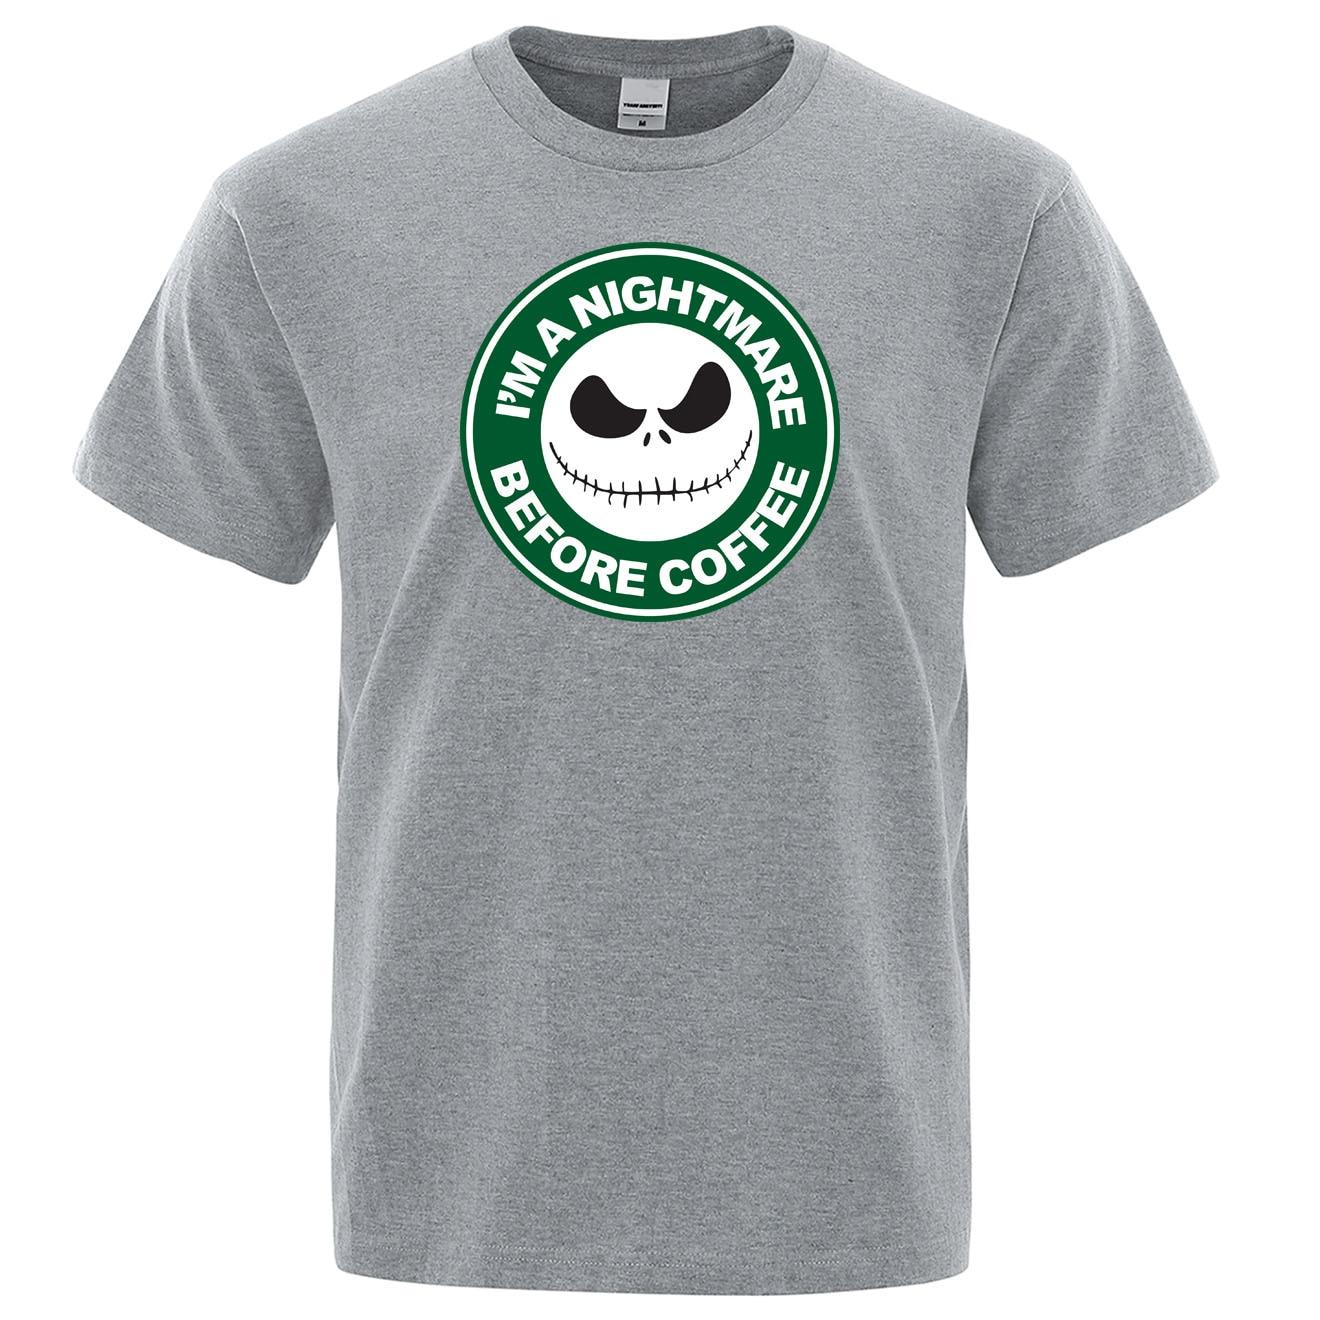 T-shirt Jack Skellington Starbucks Parodie Créer Son T Shirt